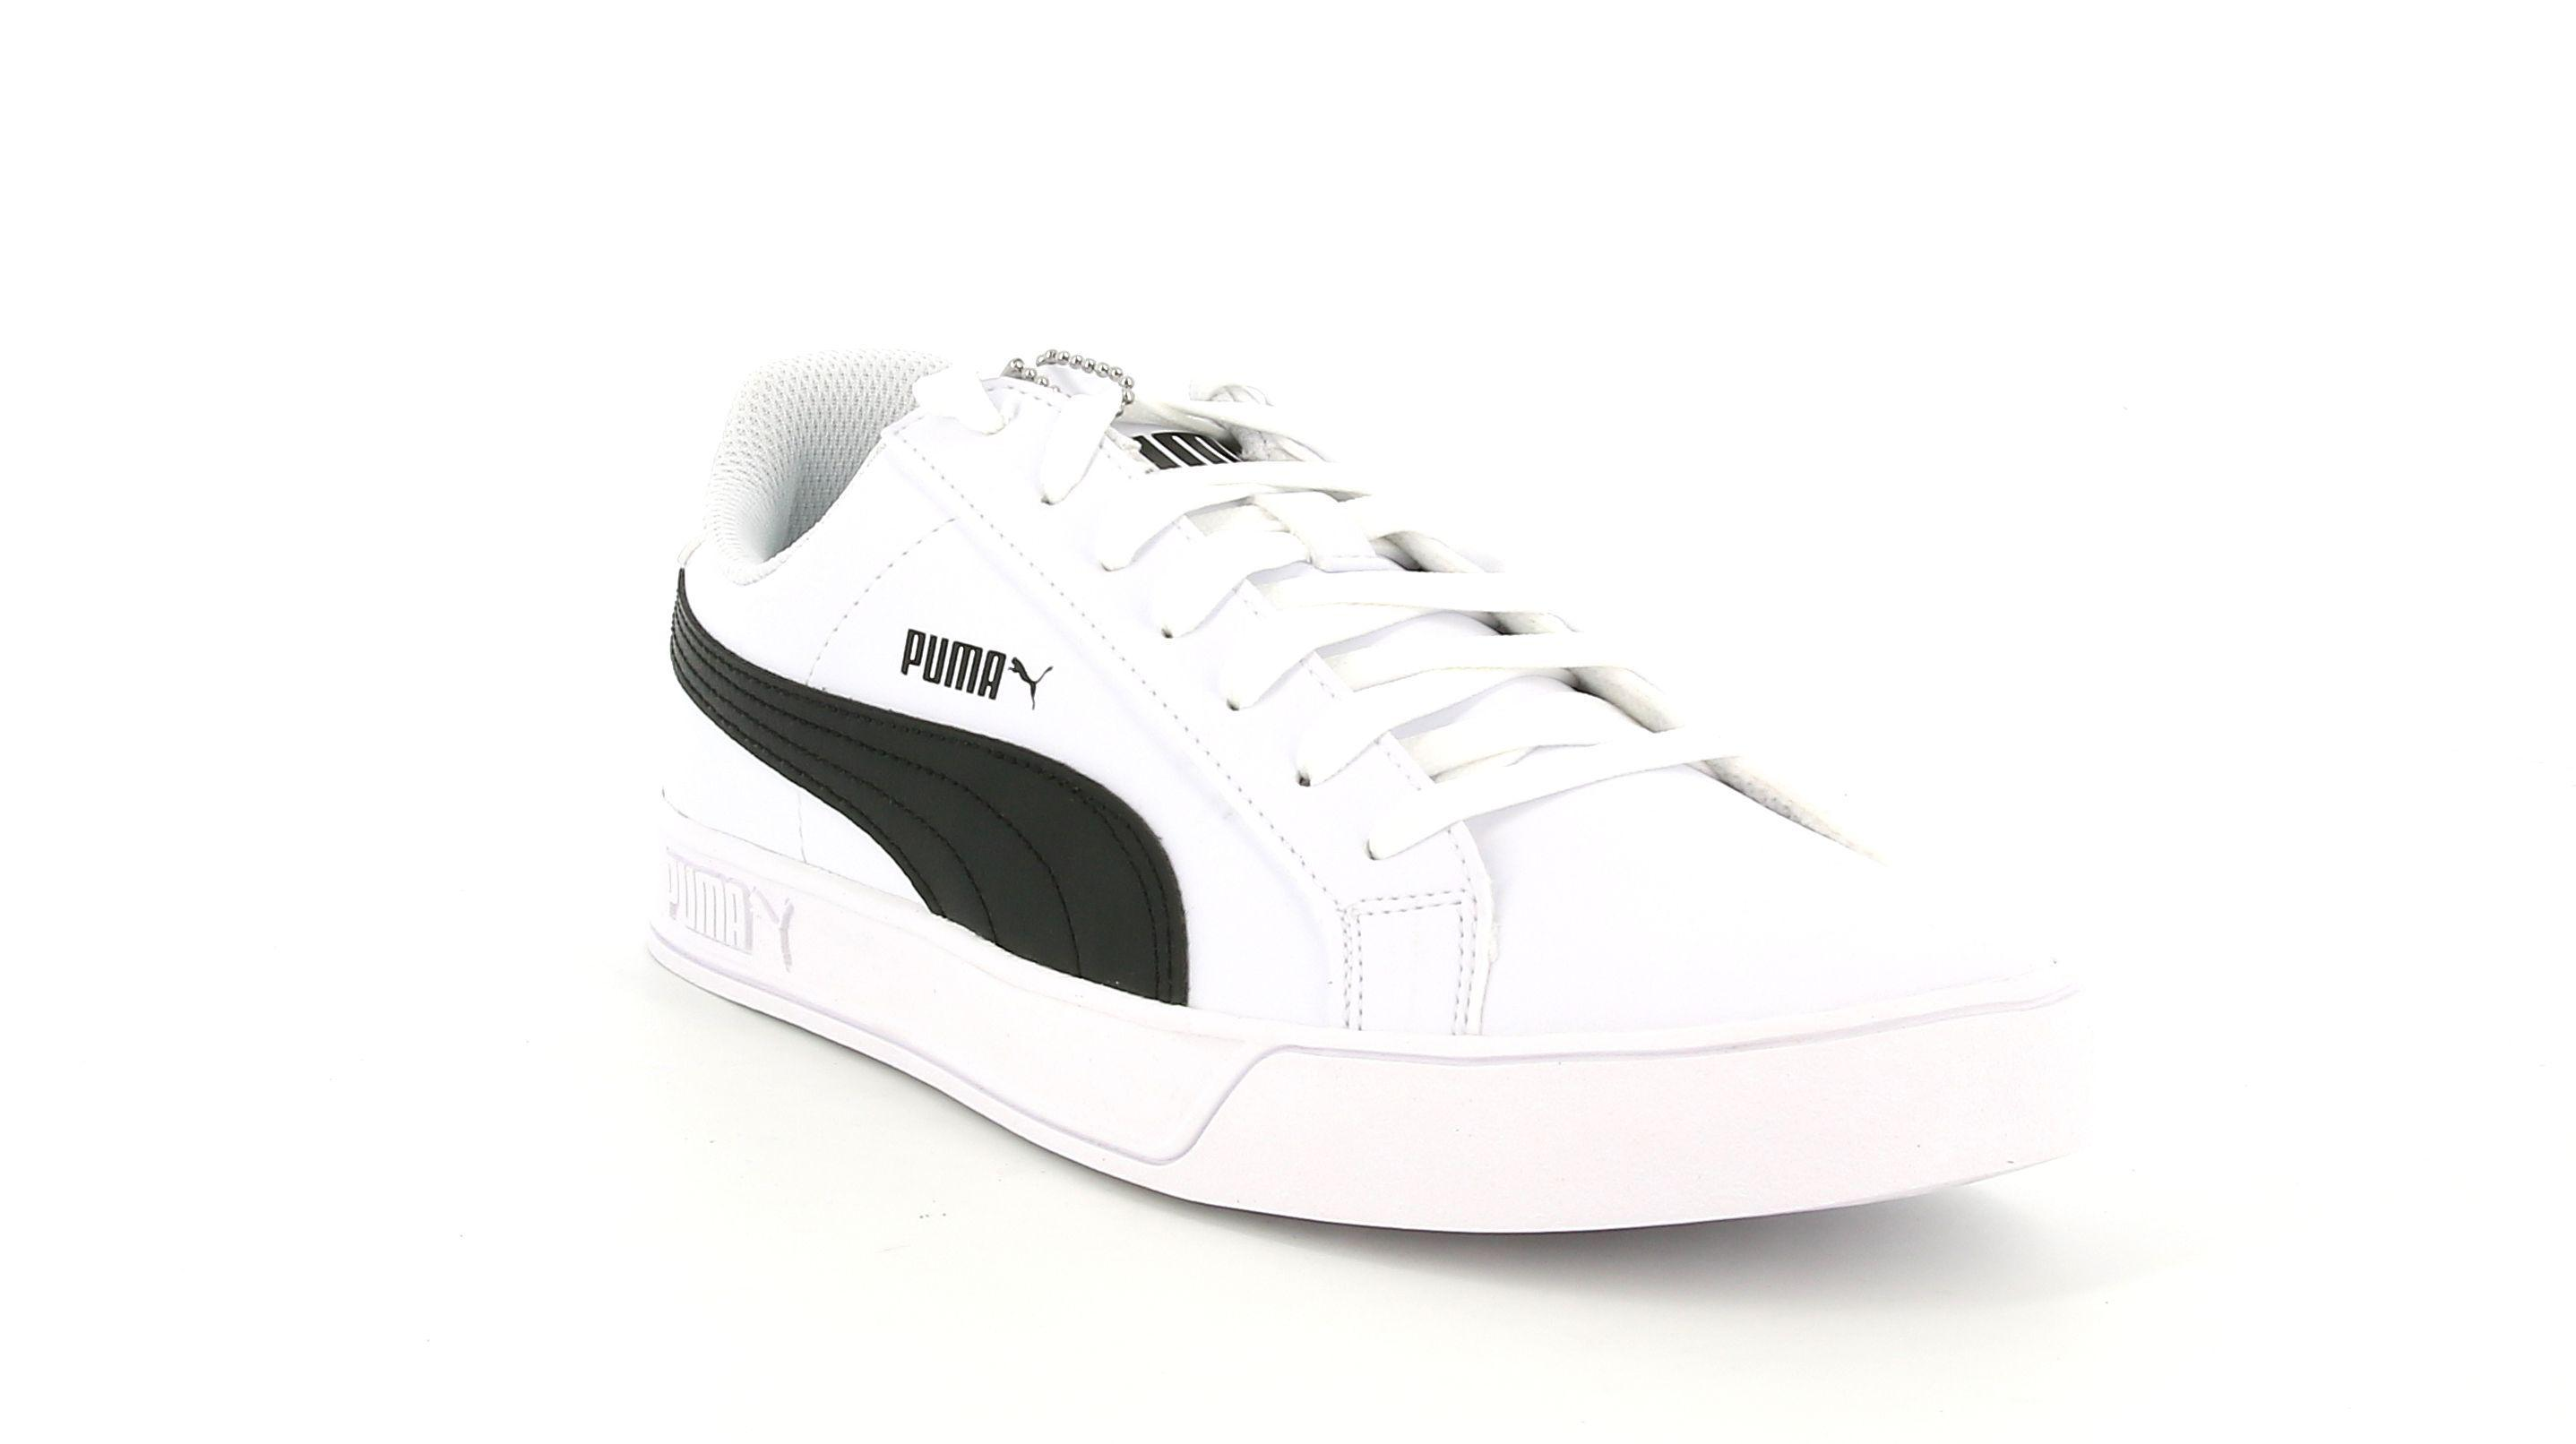 puma puma smash vulc uomo 359622 005 bianco sneaker bassa